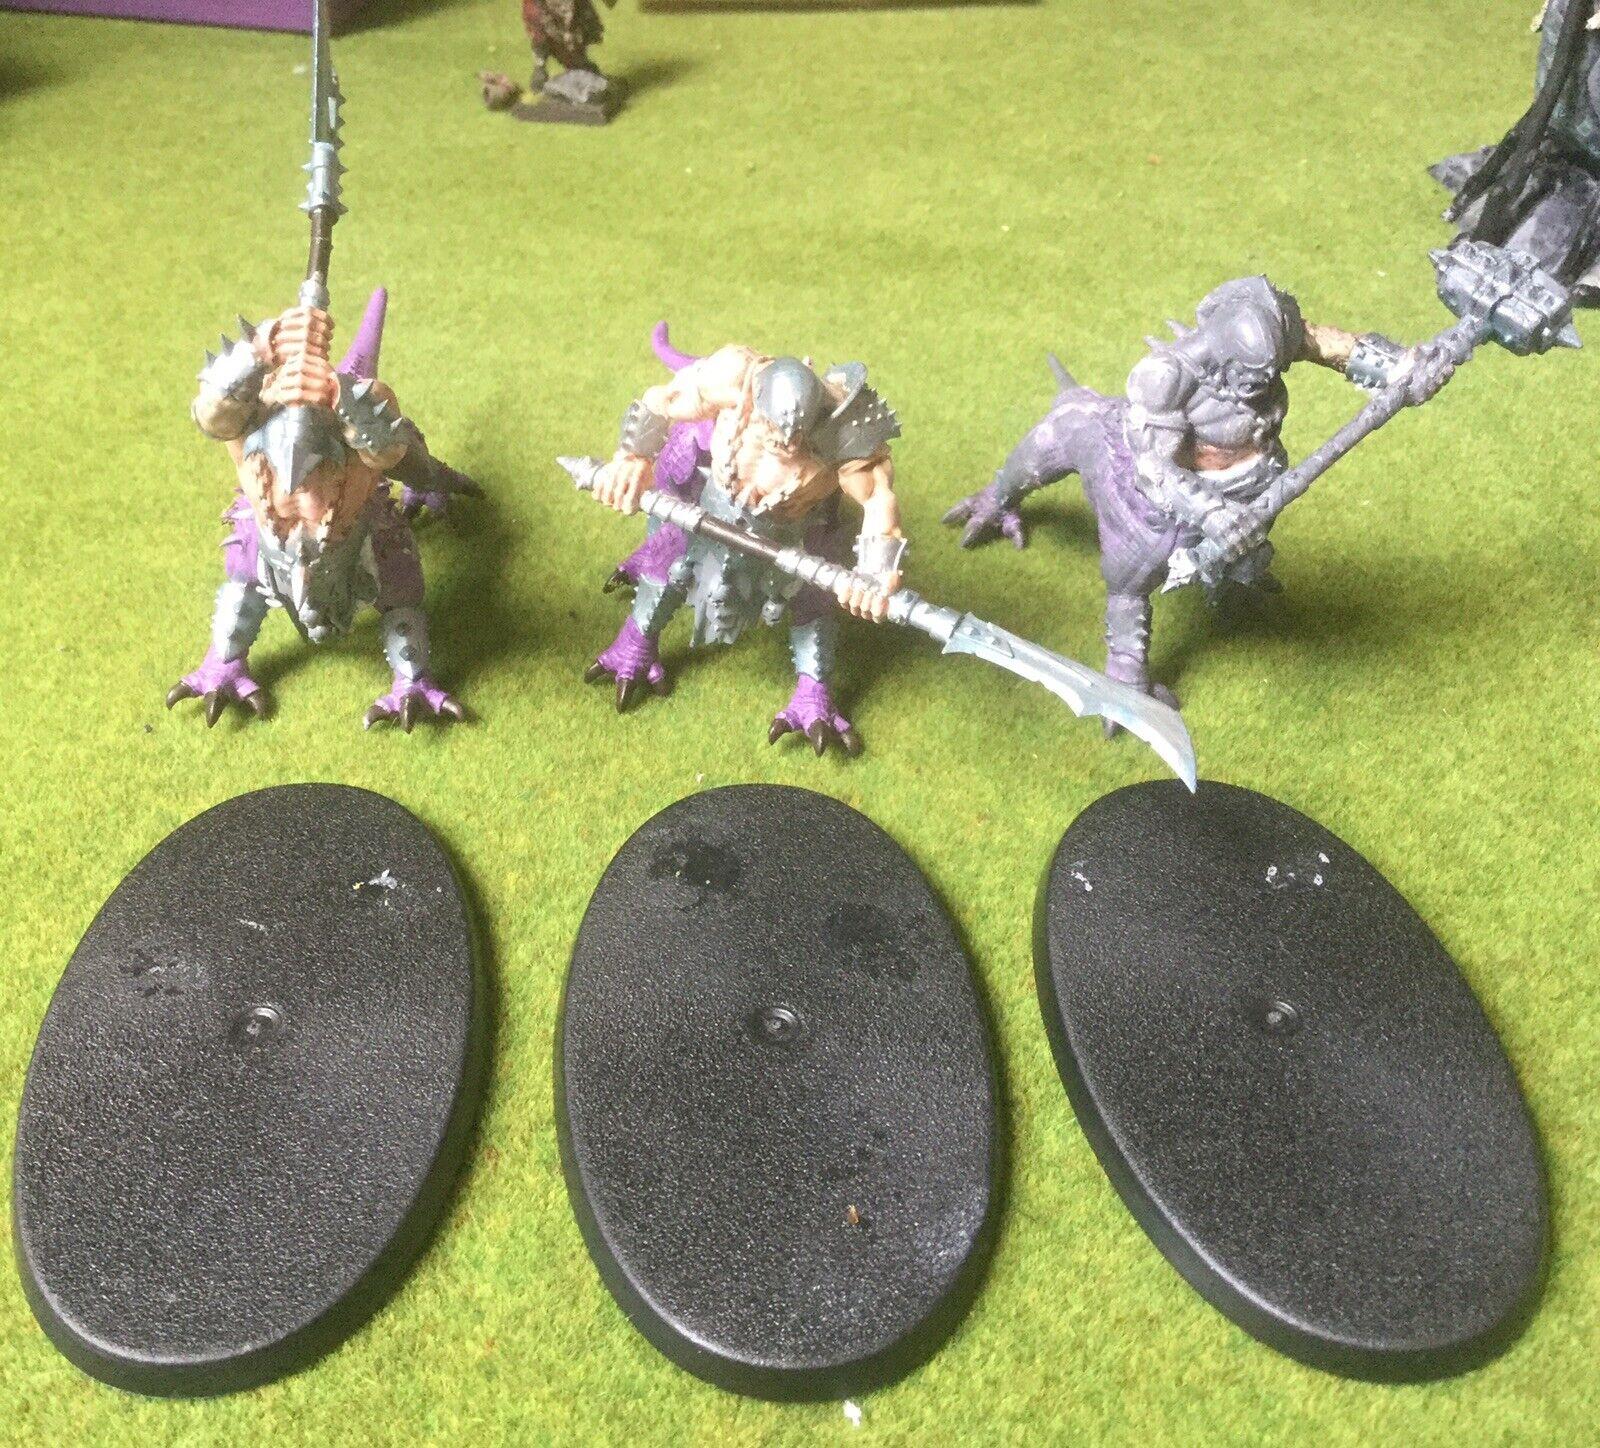 Warhammer-Bestias del Caos - 3x Dragon ogros (ref 1) Exc Con Publica Gratis